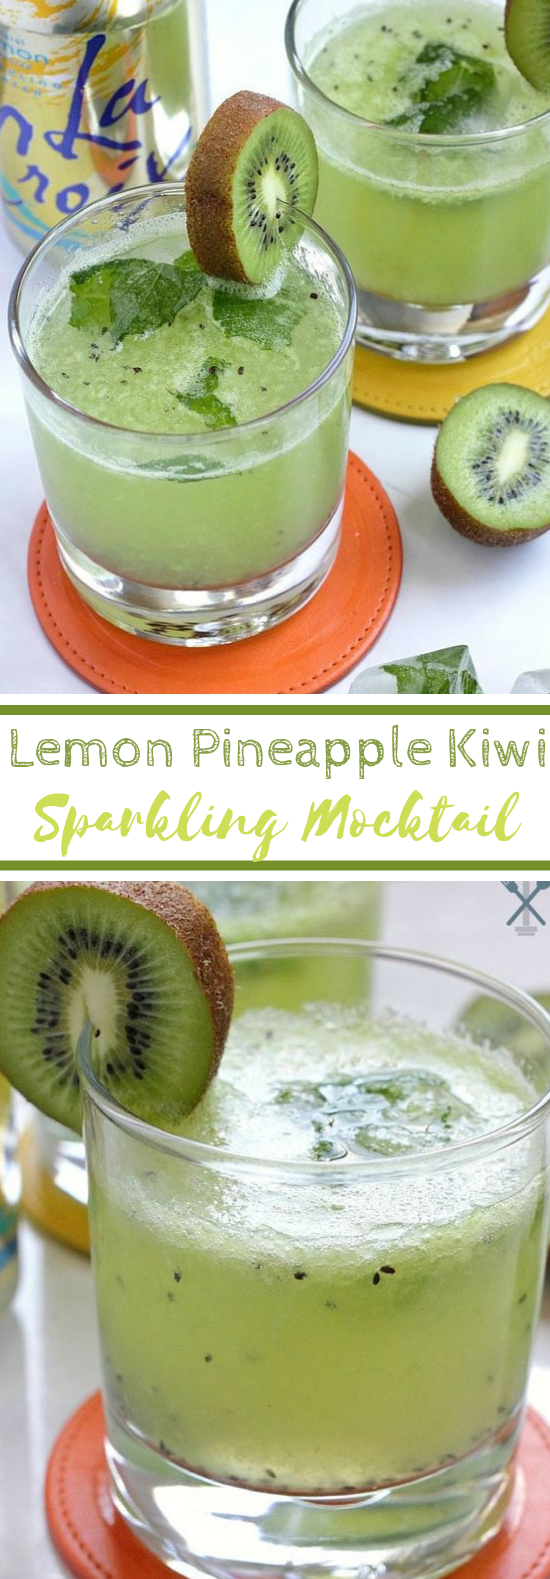 Lemon Pineapple Kiwi Sparkling Mocktail #cocktail #drinks